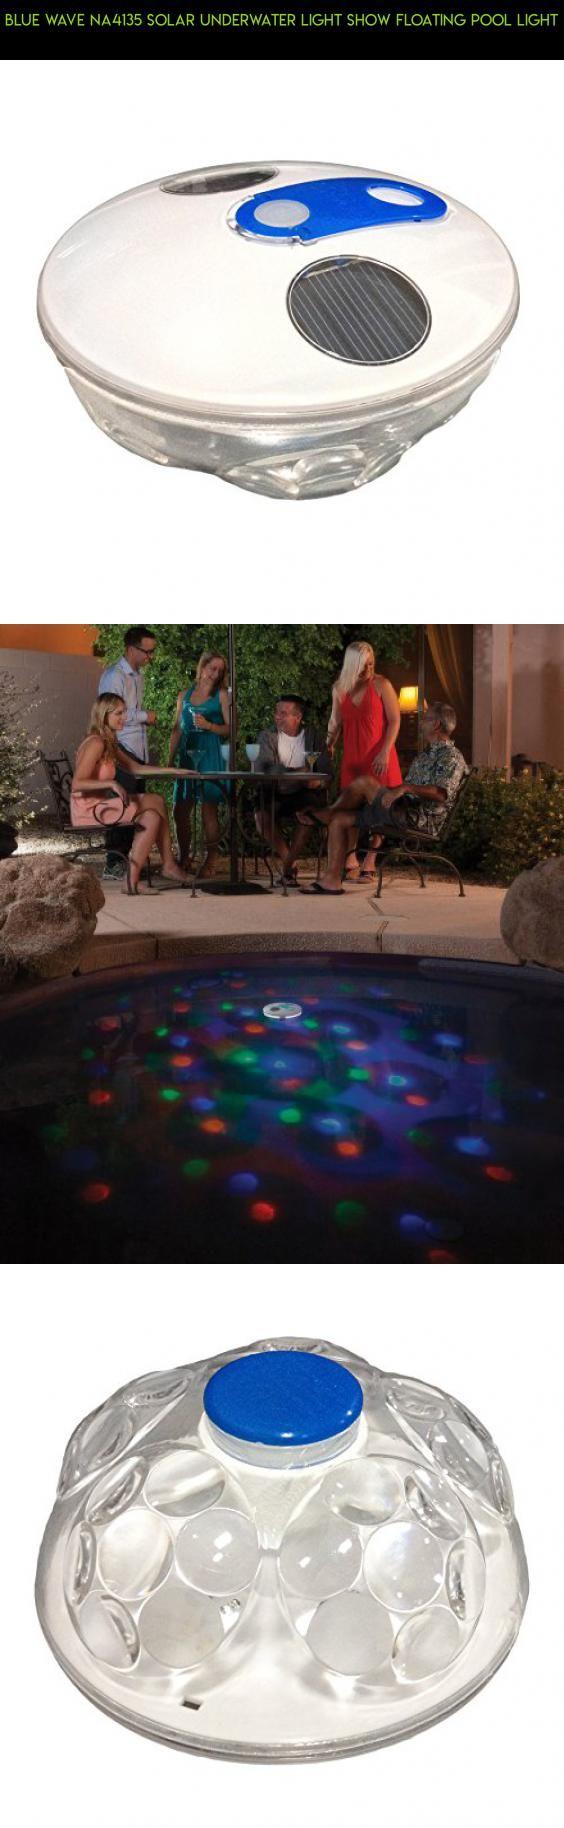 Floating pool lights on pinterest solar pool lights backyard pool - Blue Wave Na4135 Solar Underwater Light Show Floating Pool Light Shopping Technology Drone